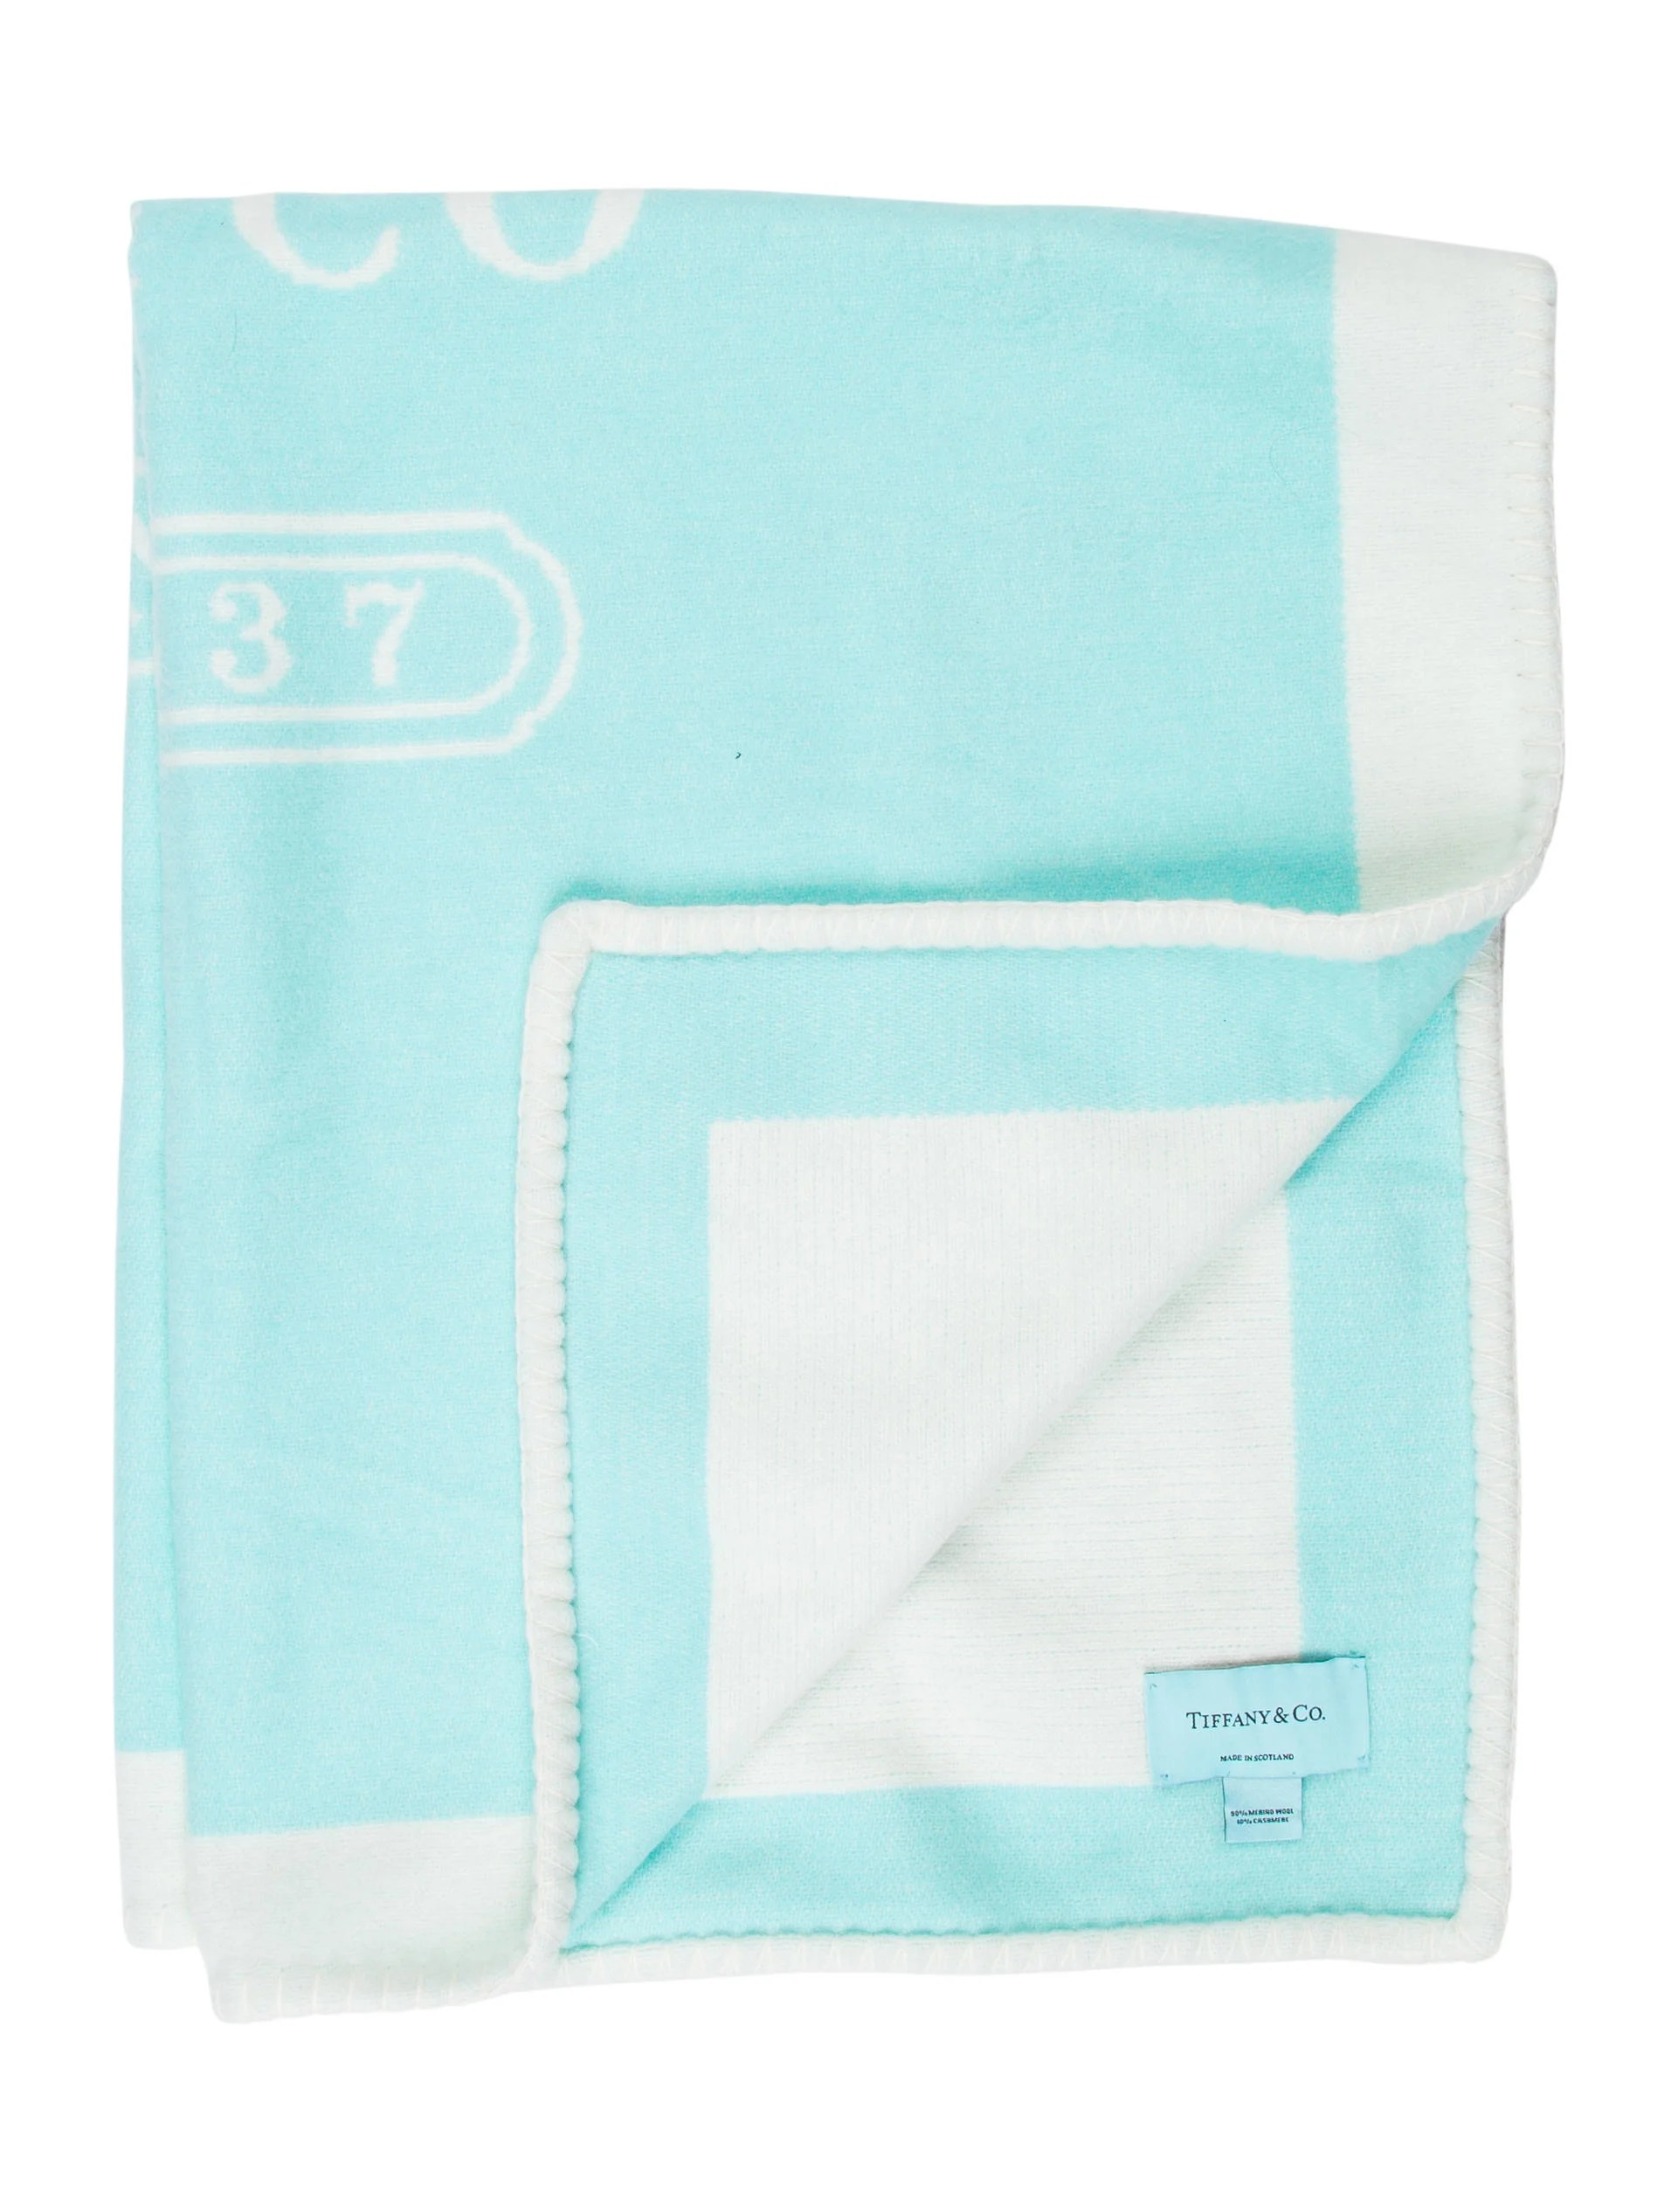 Tiffany And Co.baby : tiffany, co.baby, Tiffany, Cashmere, Blanket, Furniture, Accessories, TIF88346, RealReal